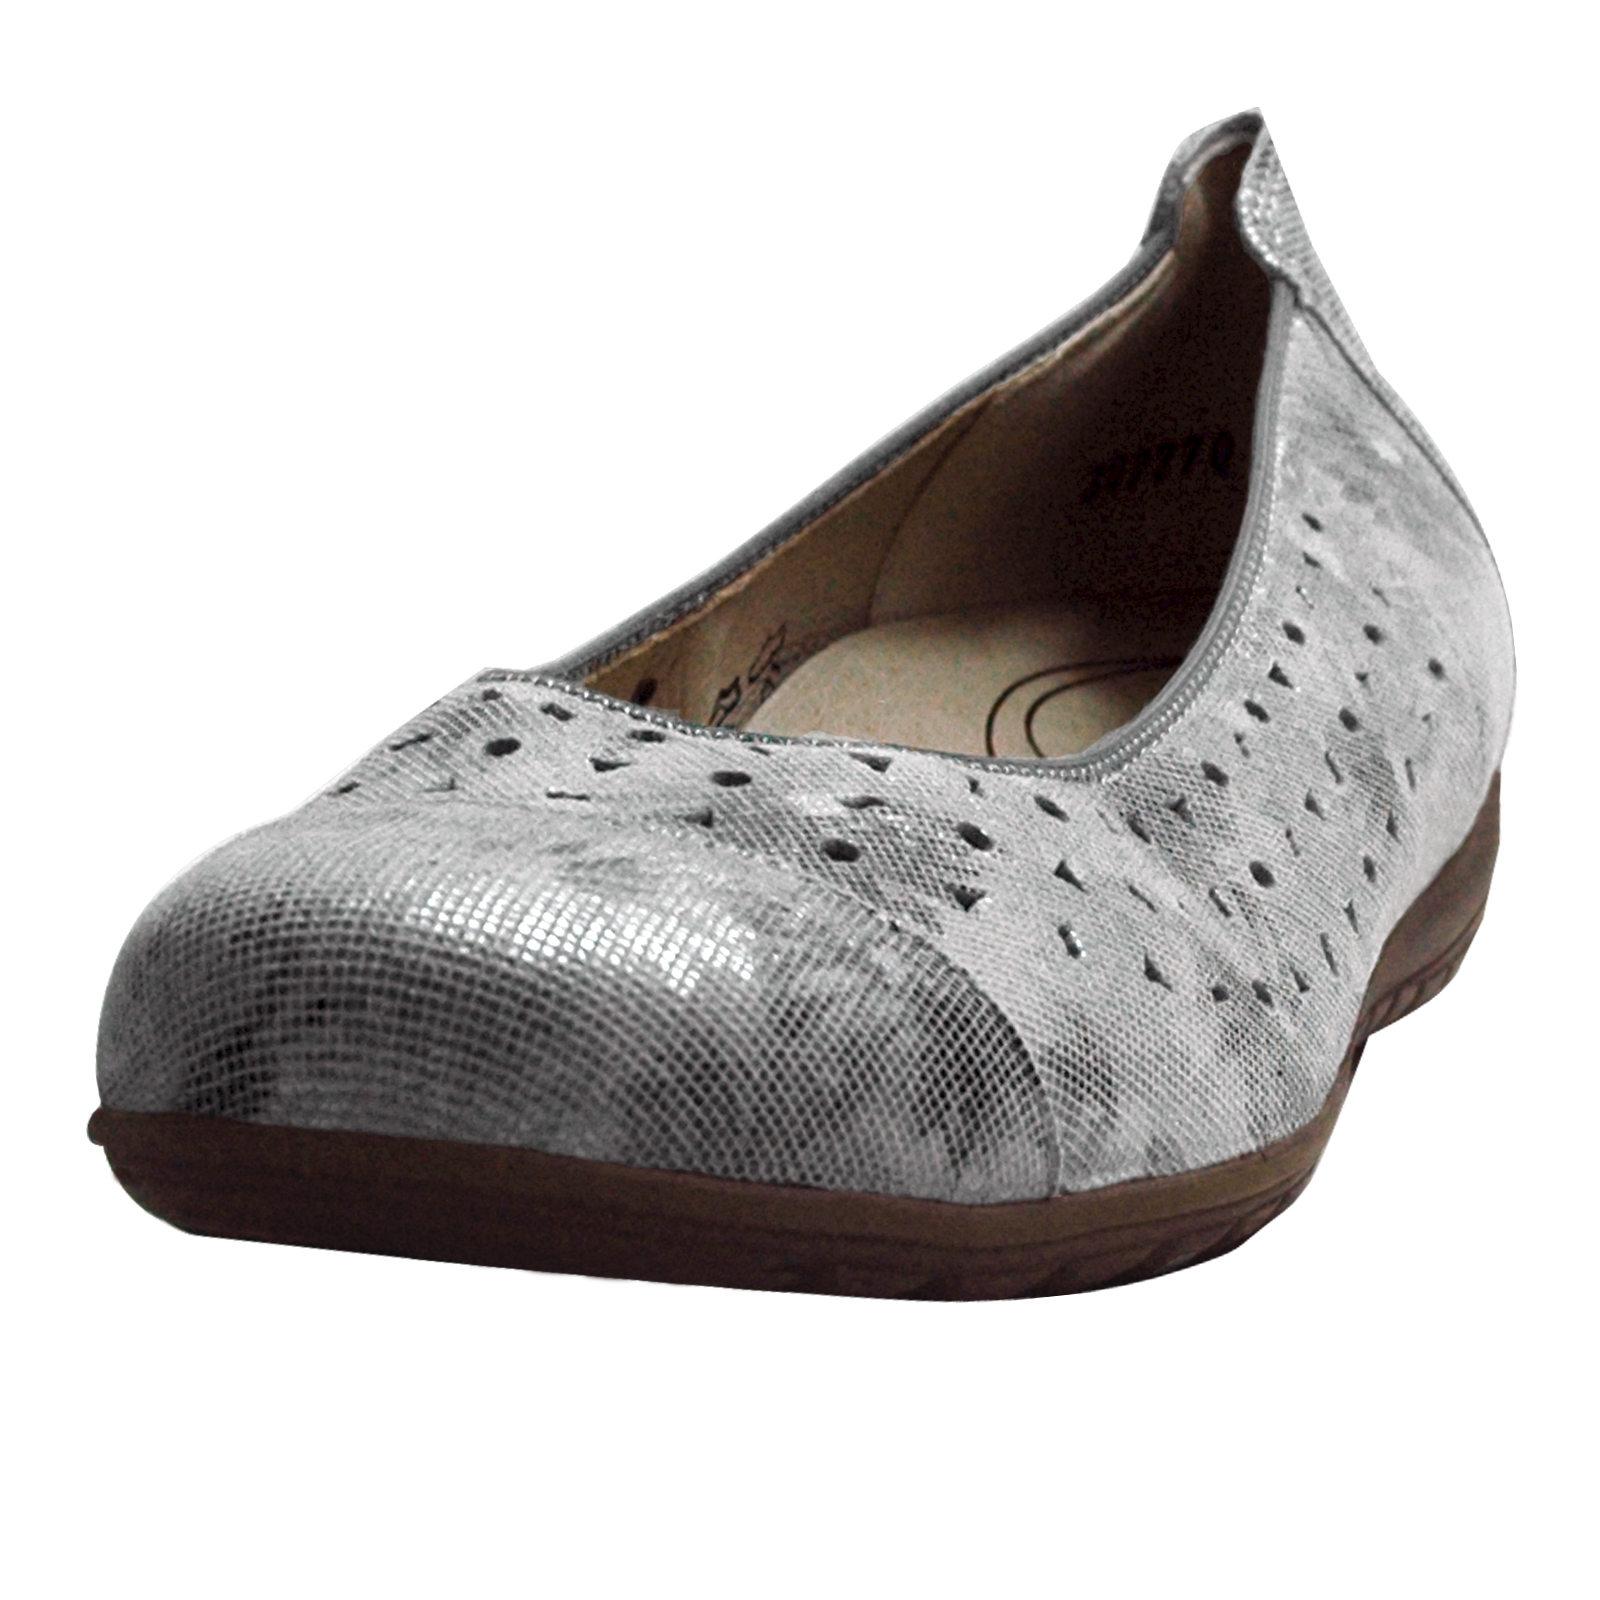 waldl ufer damen ballerinas hesima 329050168070 weite h. Black Bedroom Furniture Sets. Home Design Ideas